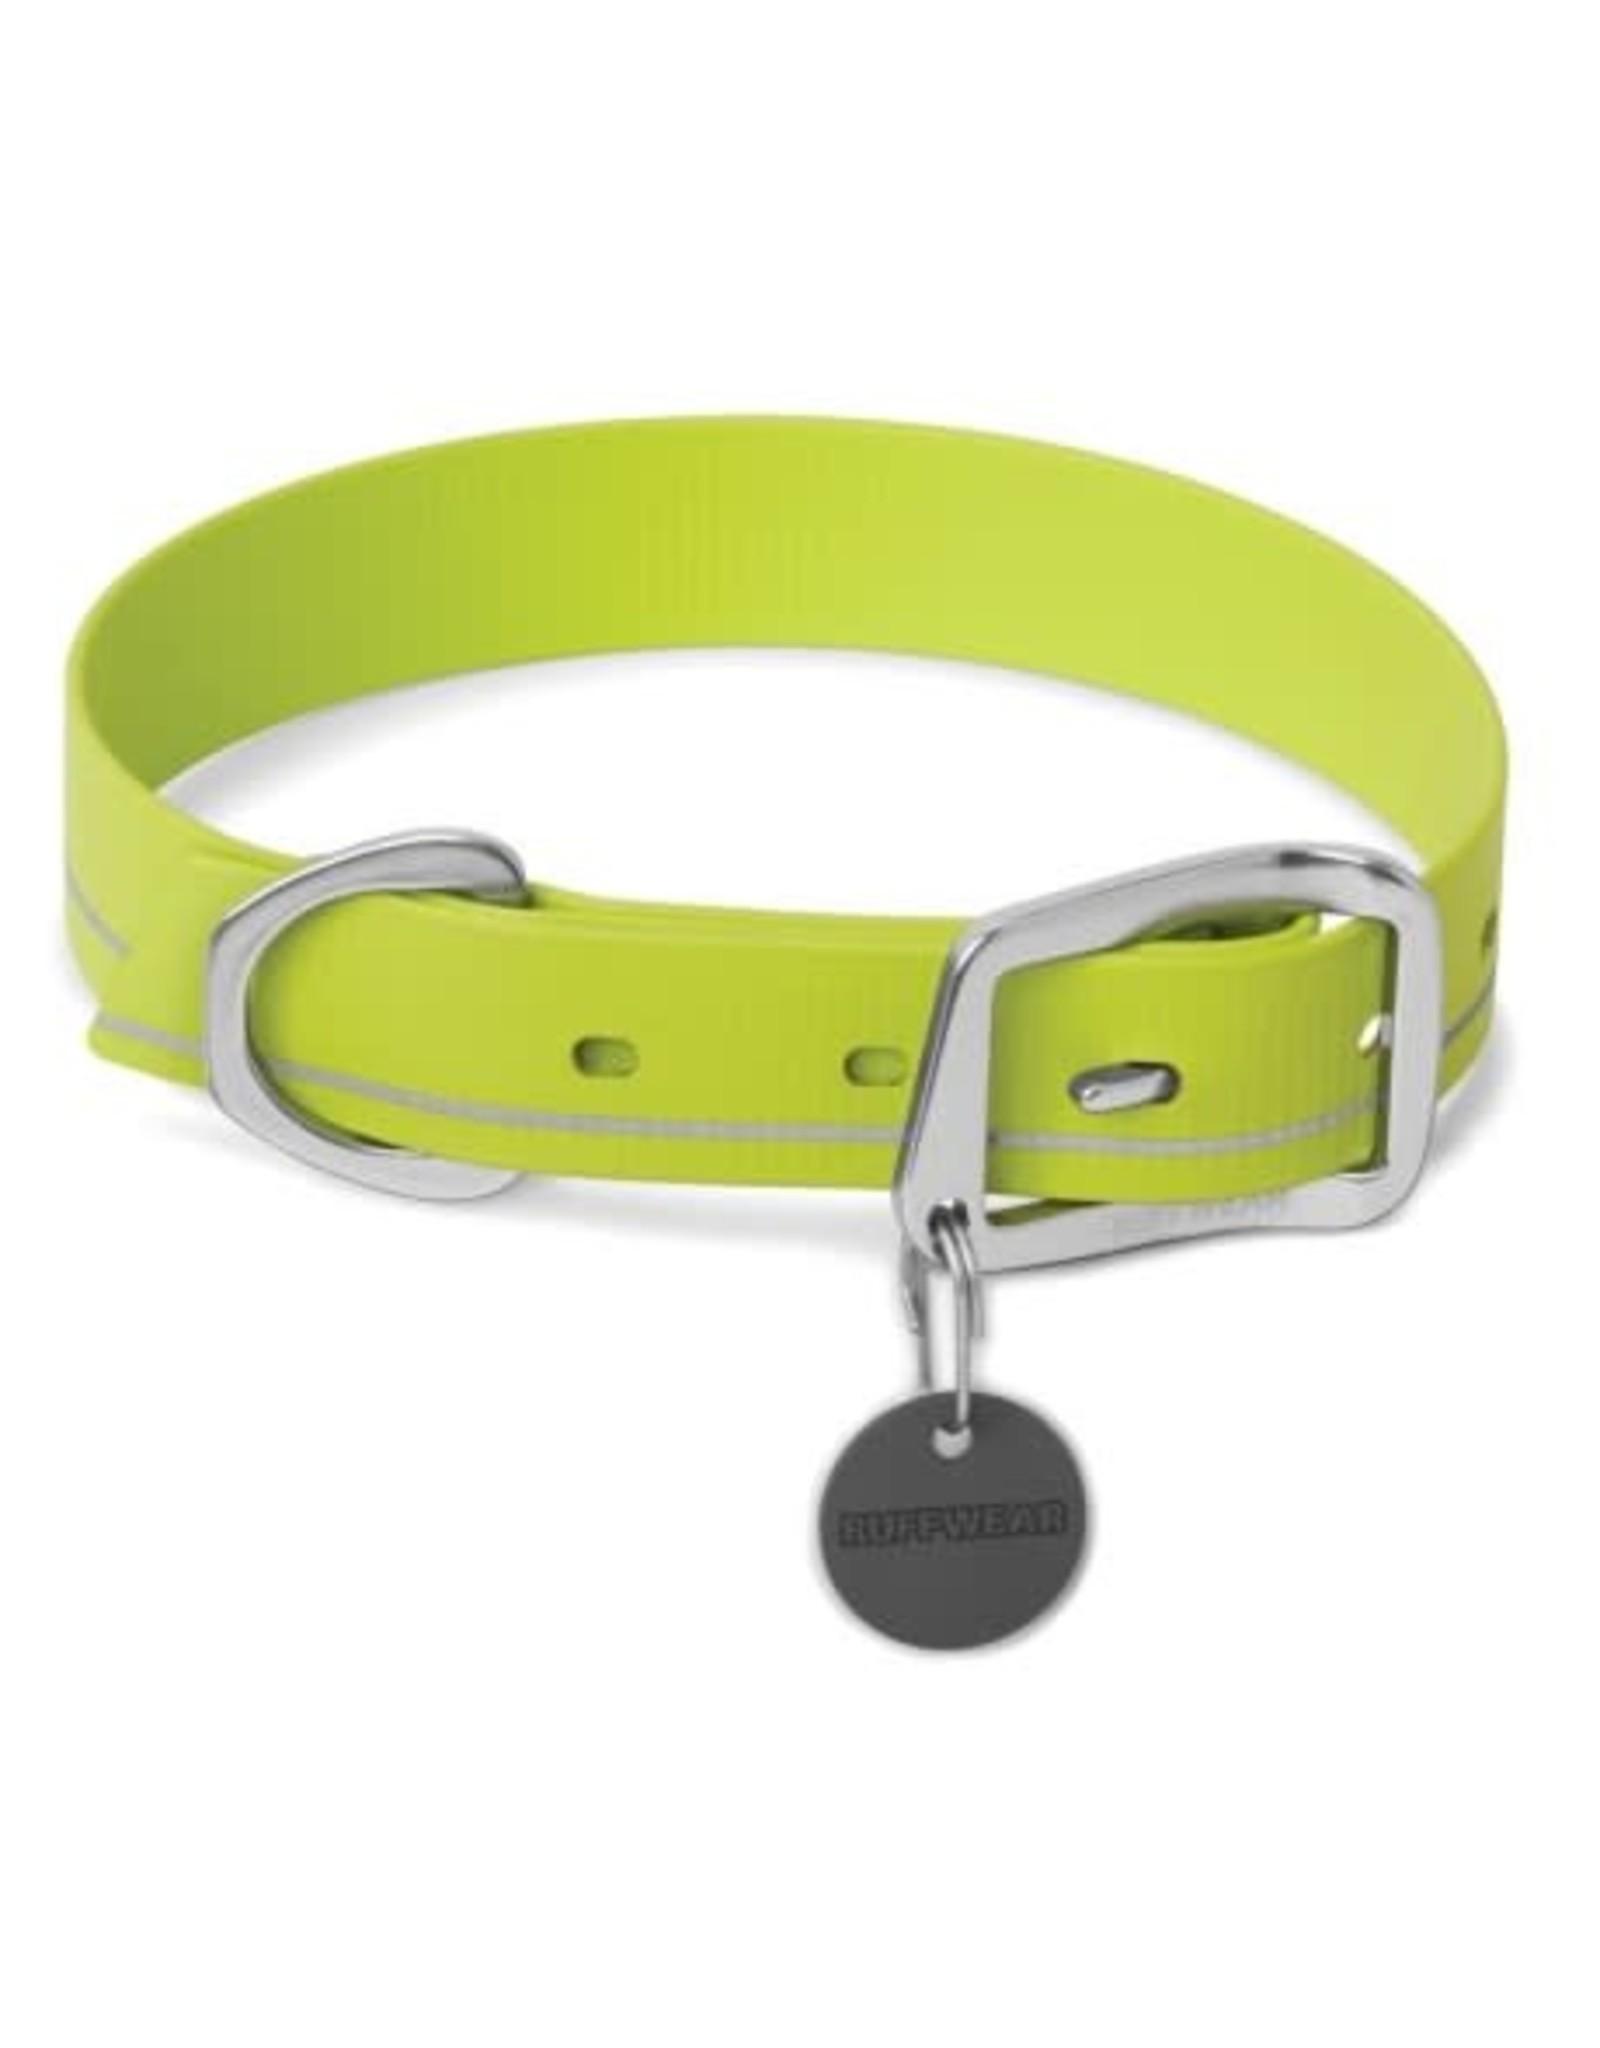 Headwater Collar: Fern Green, 20 - 23 inch